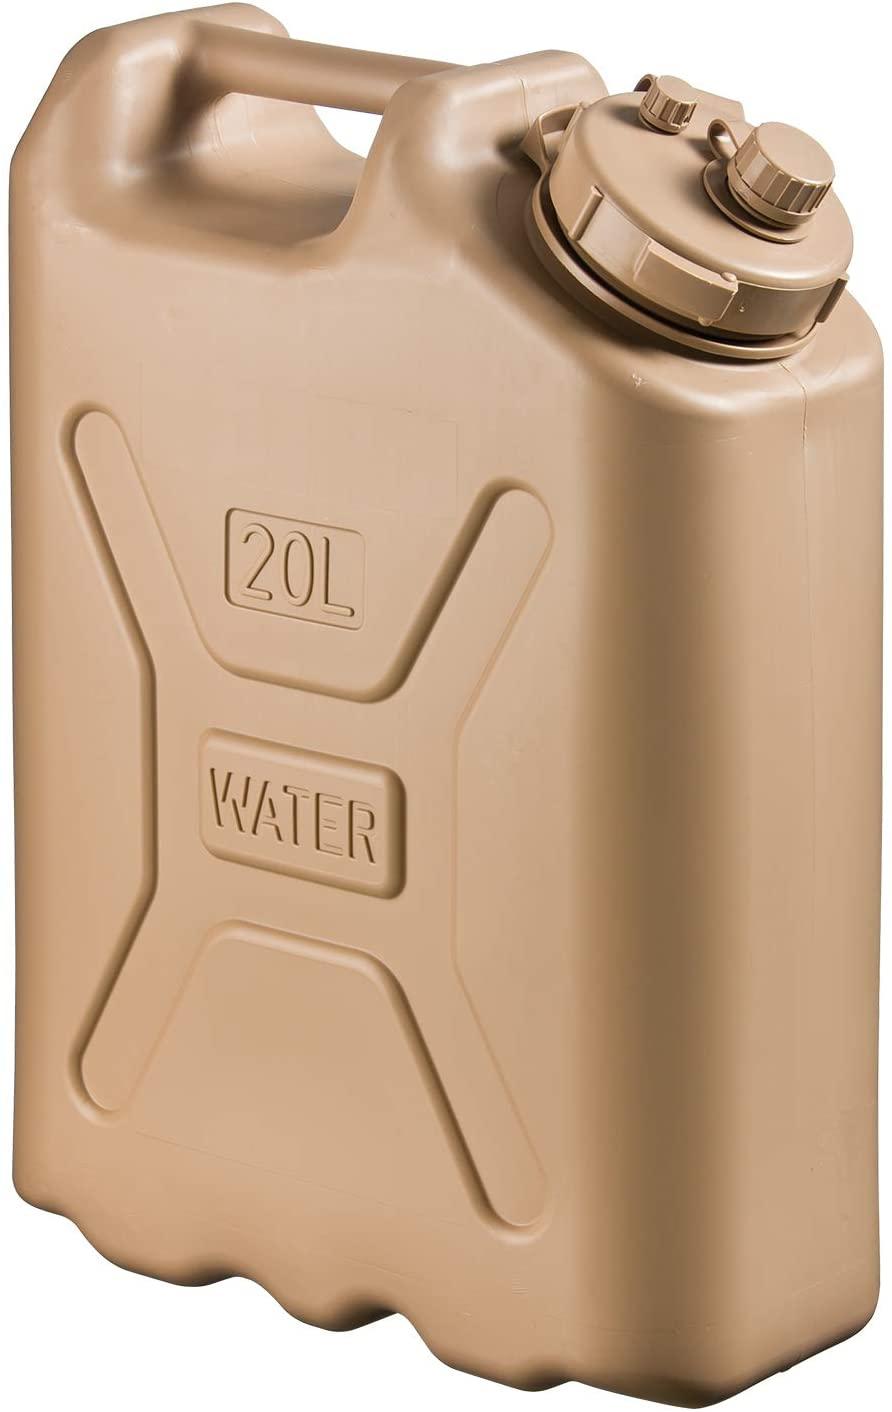 Bình nước Scepter BPA Durable 5 Gallon 20 Liter Portable Water Storage Container - Tan